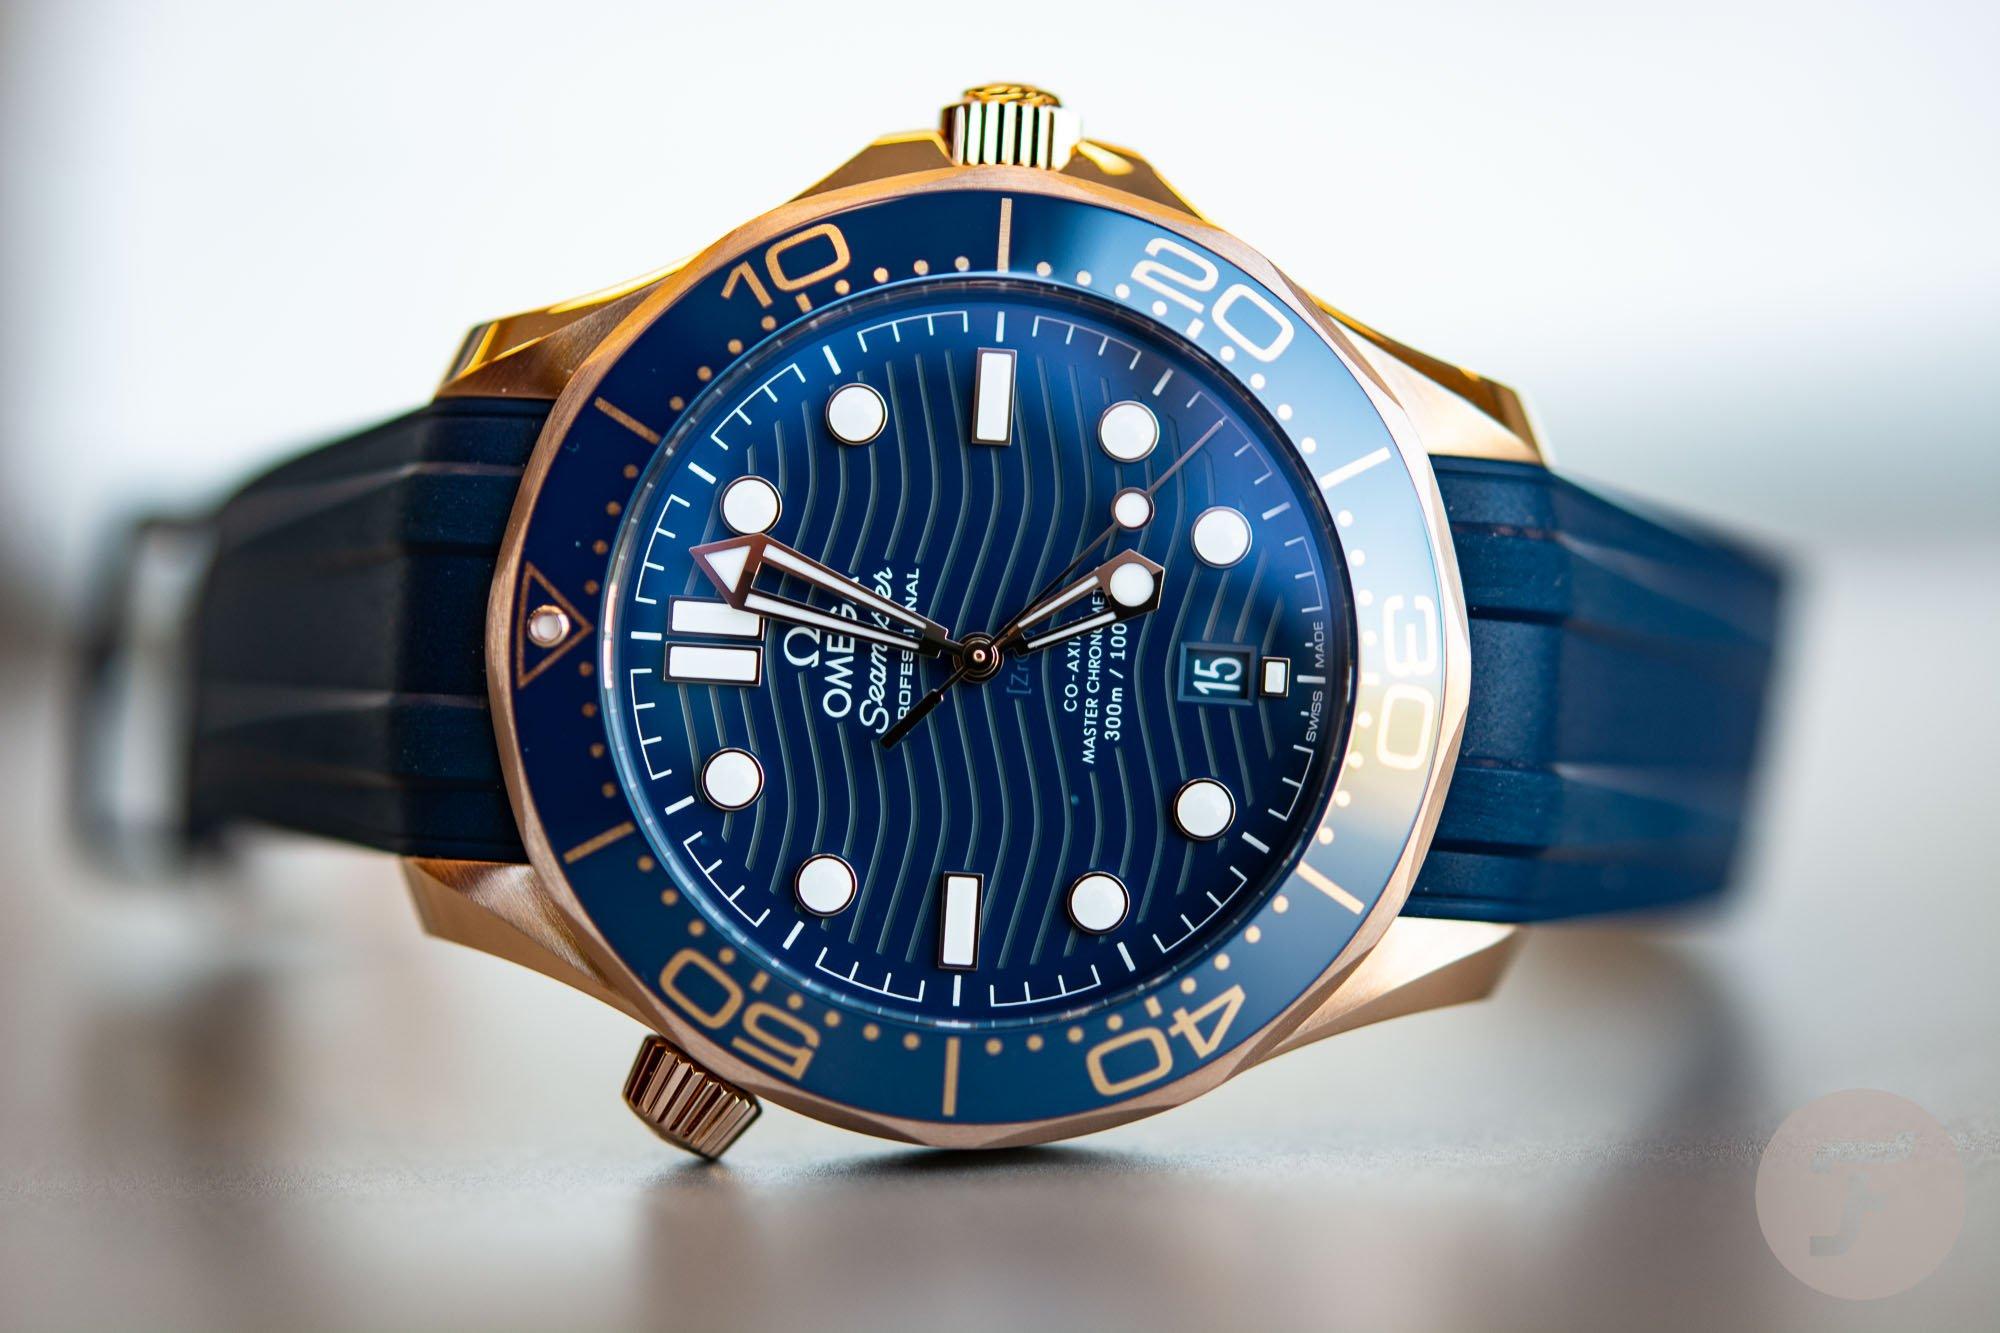 Hot Take Omega Seamaster 300m Sedna Gold